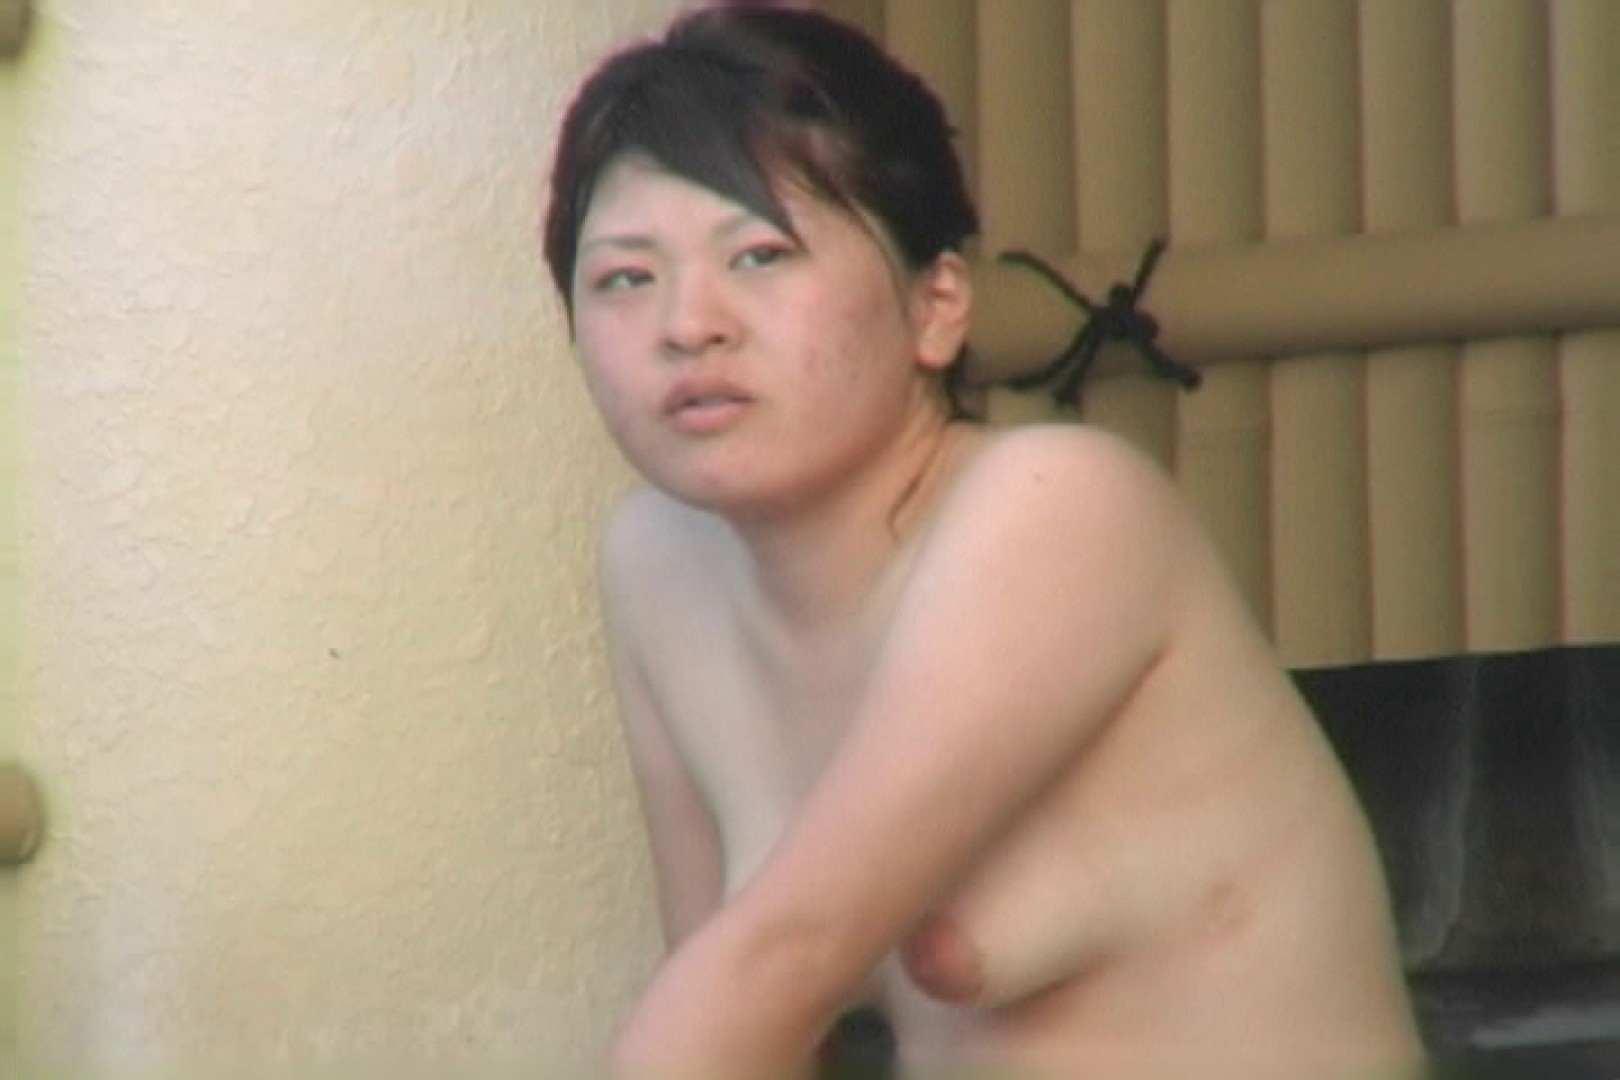 Aquaな露天風呂Vol.115 HなOL | 露天  71pic 10